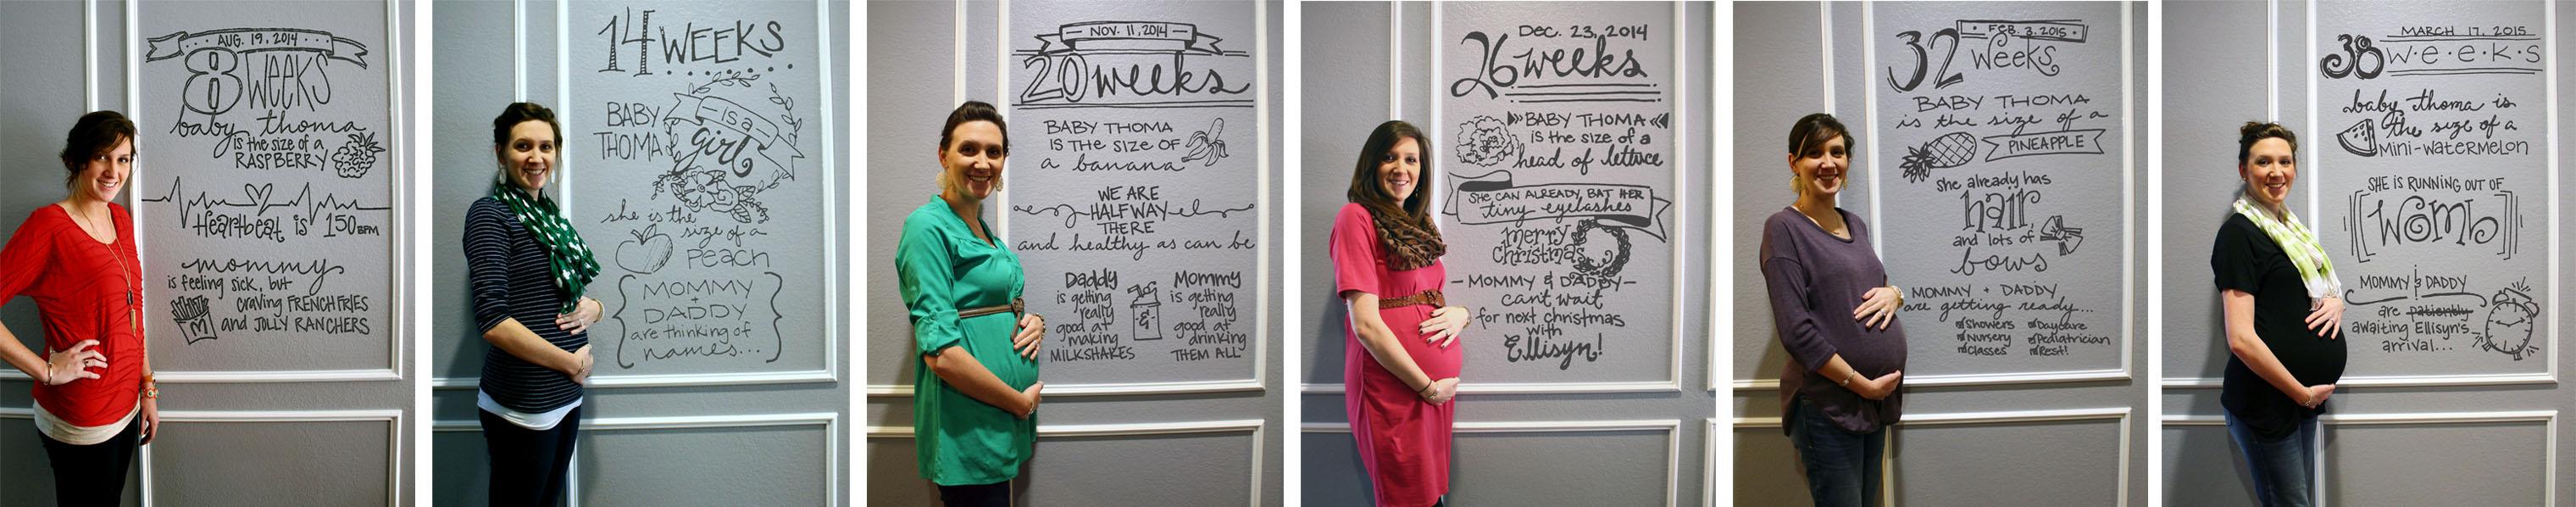 keep track of pregnancy